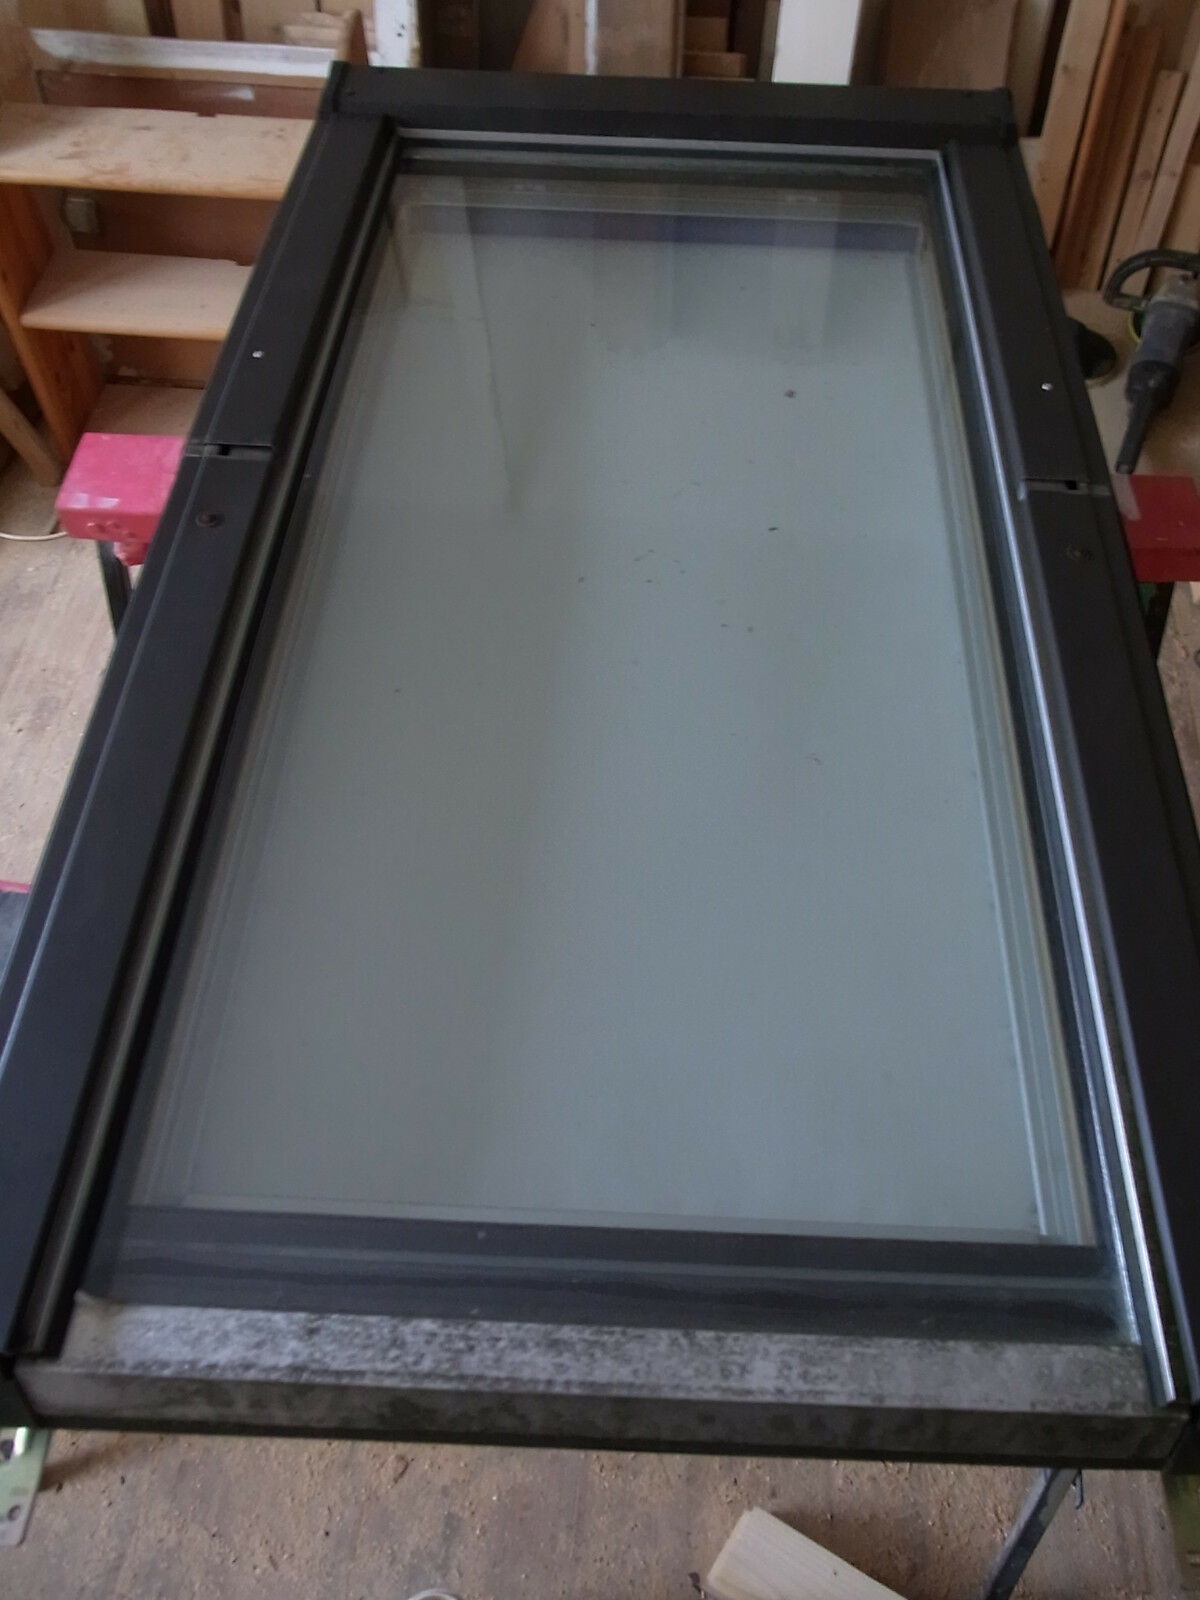 Roto Dachfenster 735 HAT 6/11 65x118cm mit Innenrollo blau